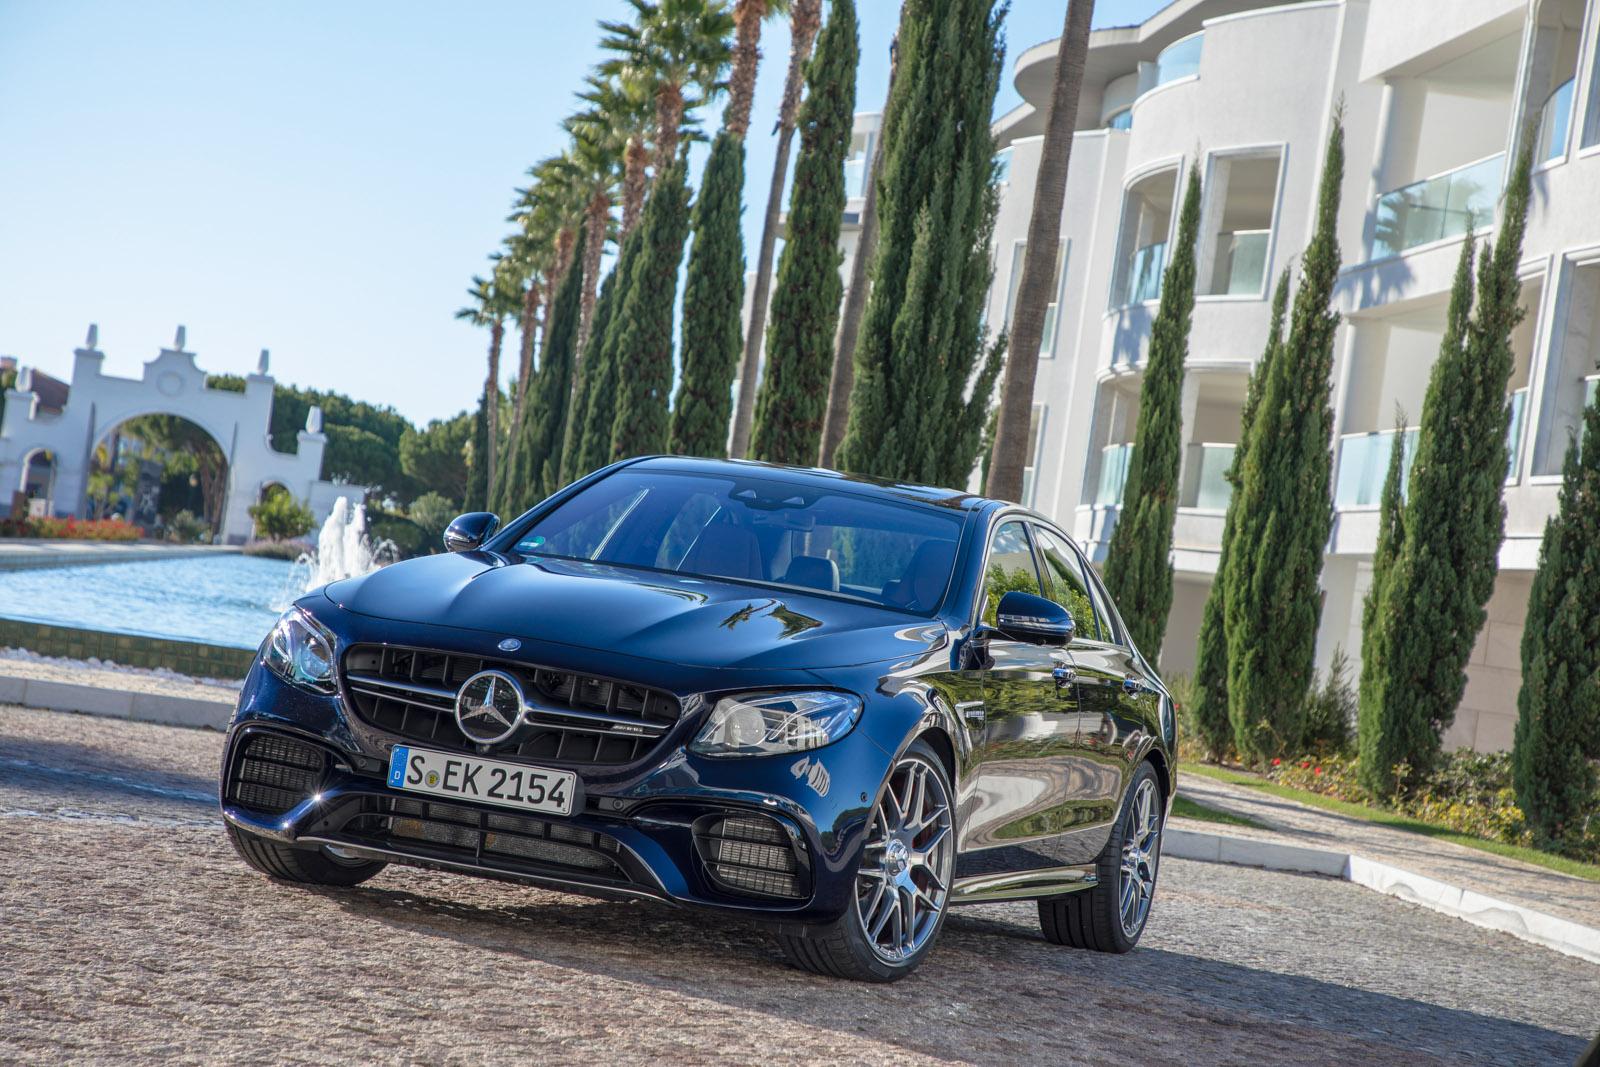 2017 mercedes amg e63 s 4matic review gtspirit for Mercedes benz e63s amg